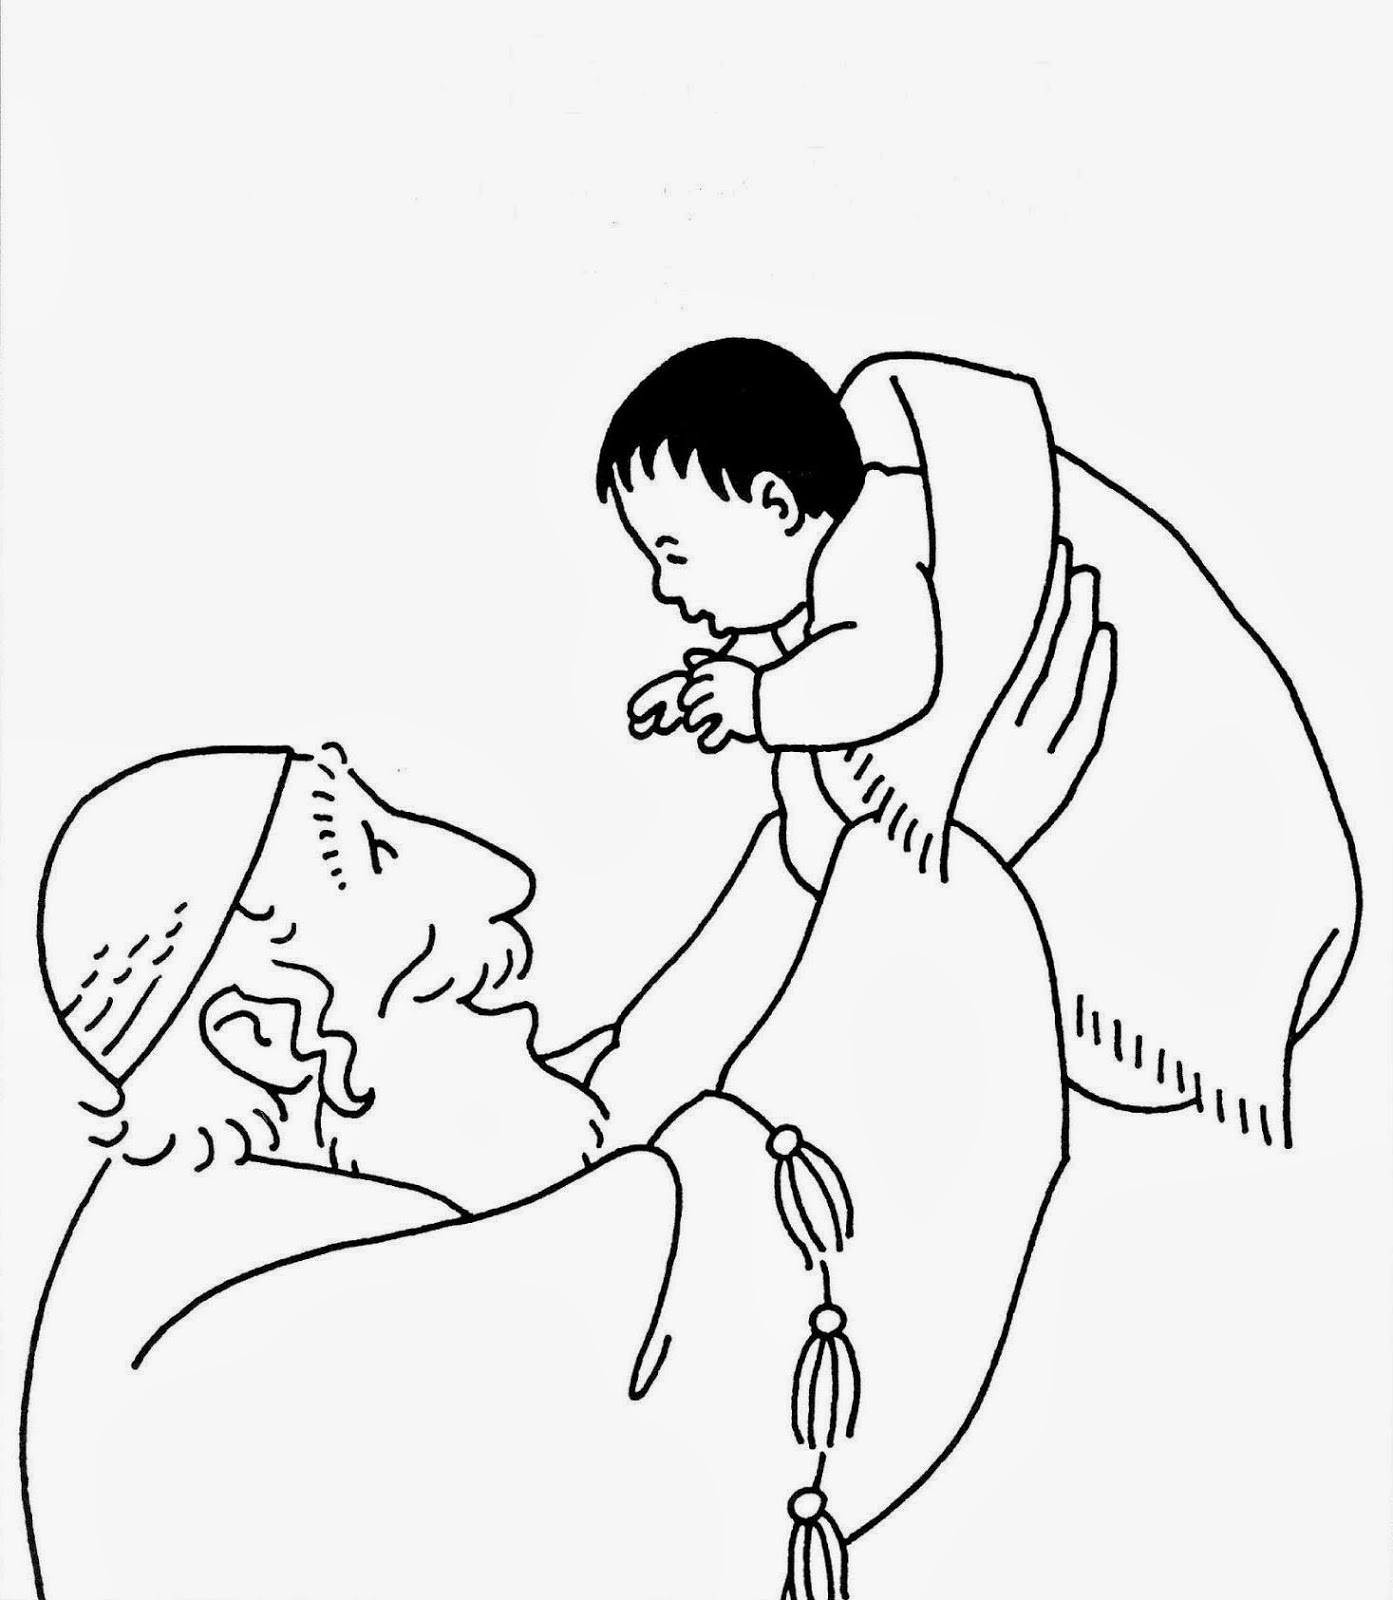 ensinanzaere: PRESENTACION DE JESÚS, DIBUJOS